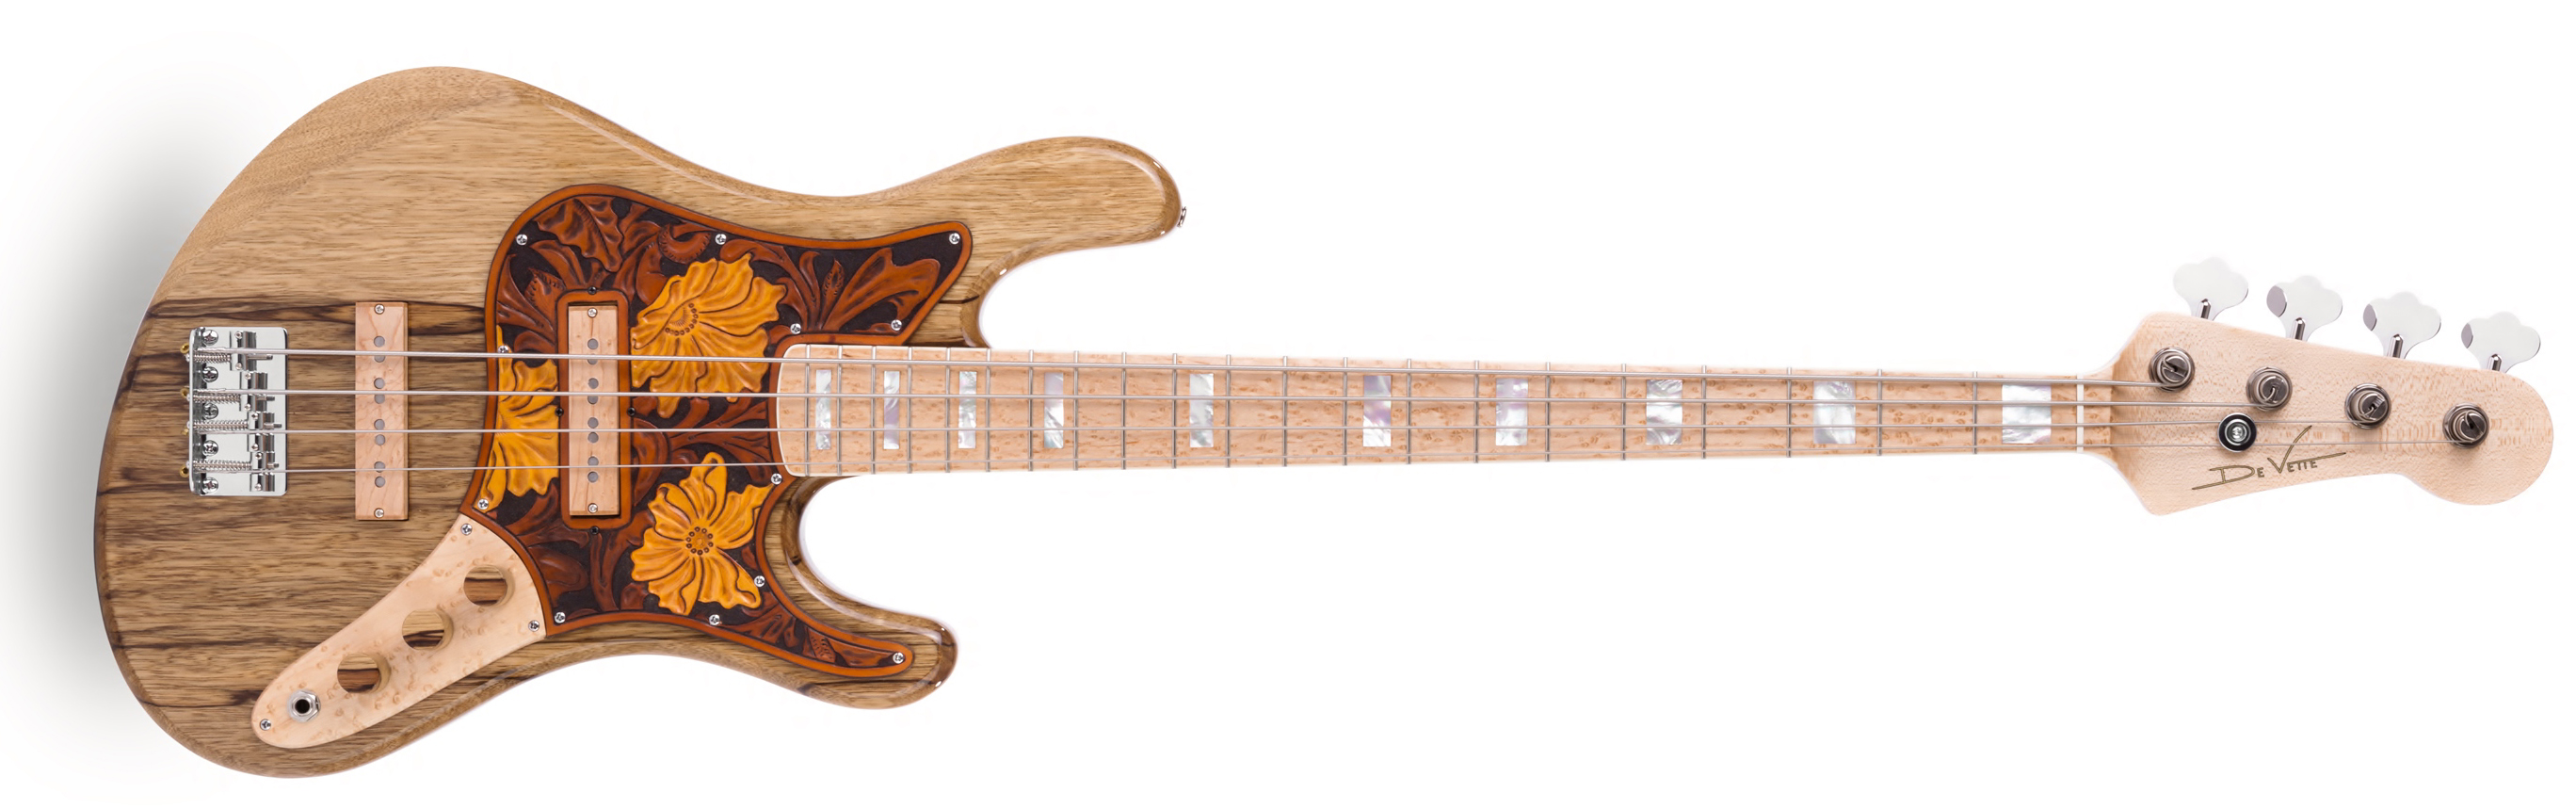 Frederiek de Vette Vintage-Style Bass